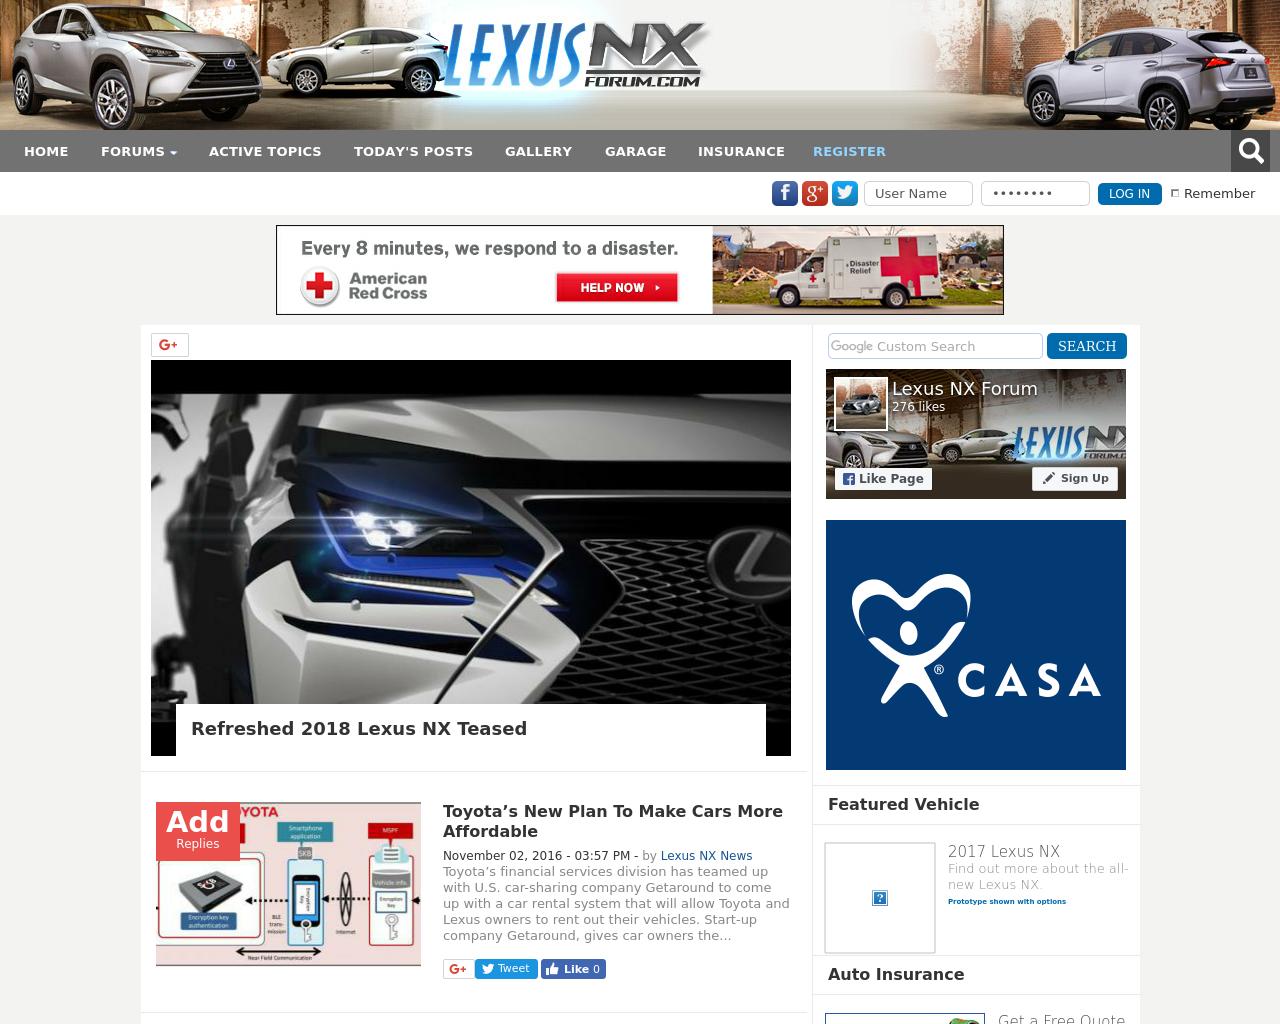 Lexus-NX-Forum.com-Advertising-Reviews-Pricing